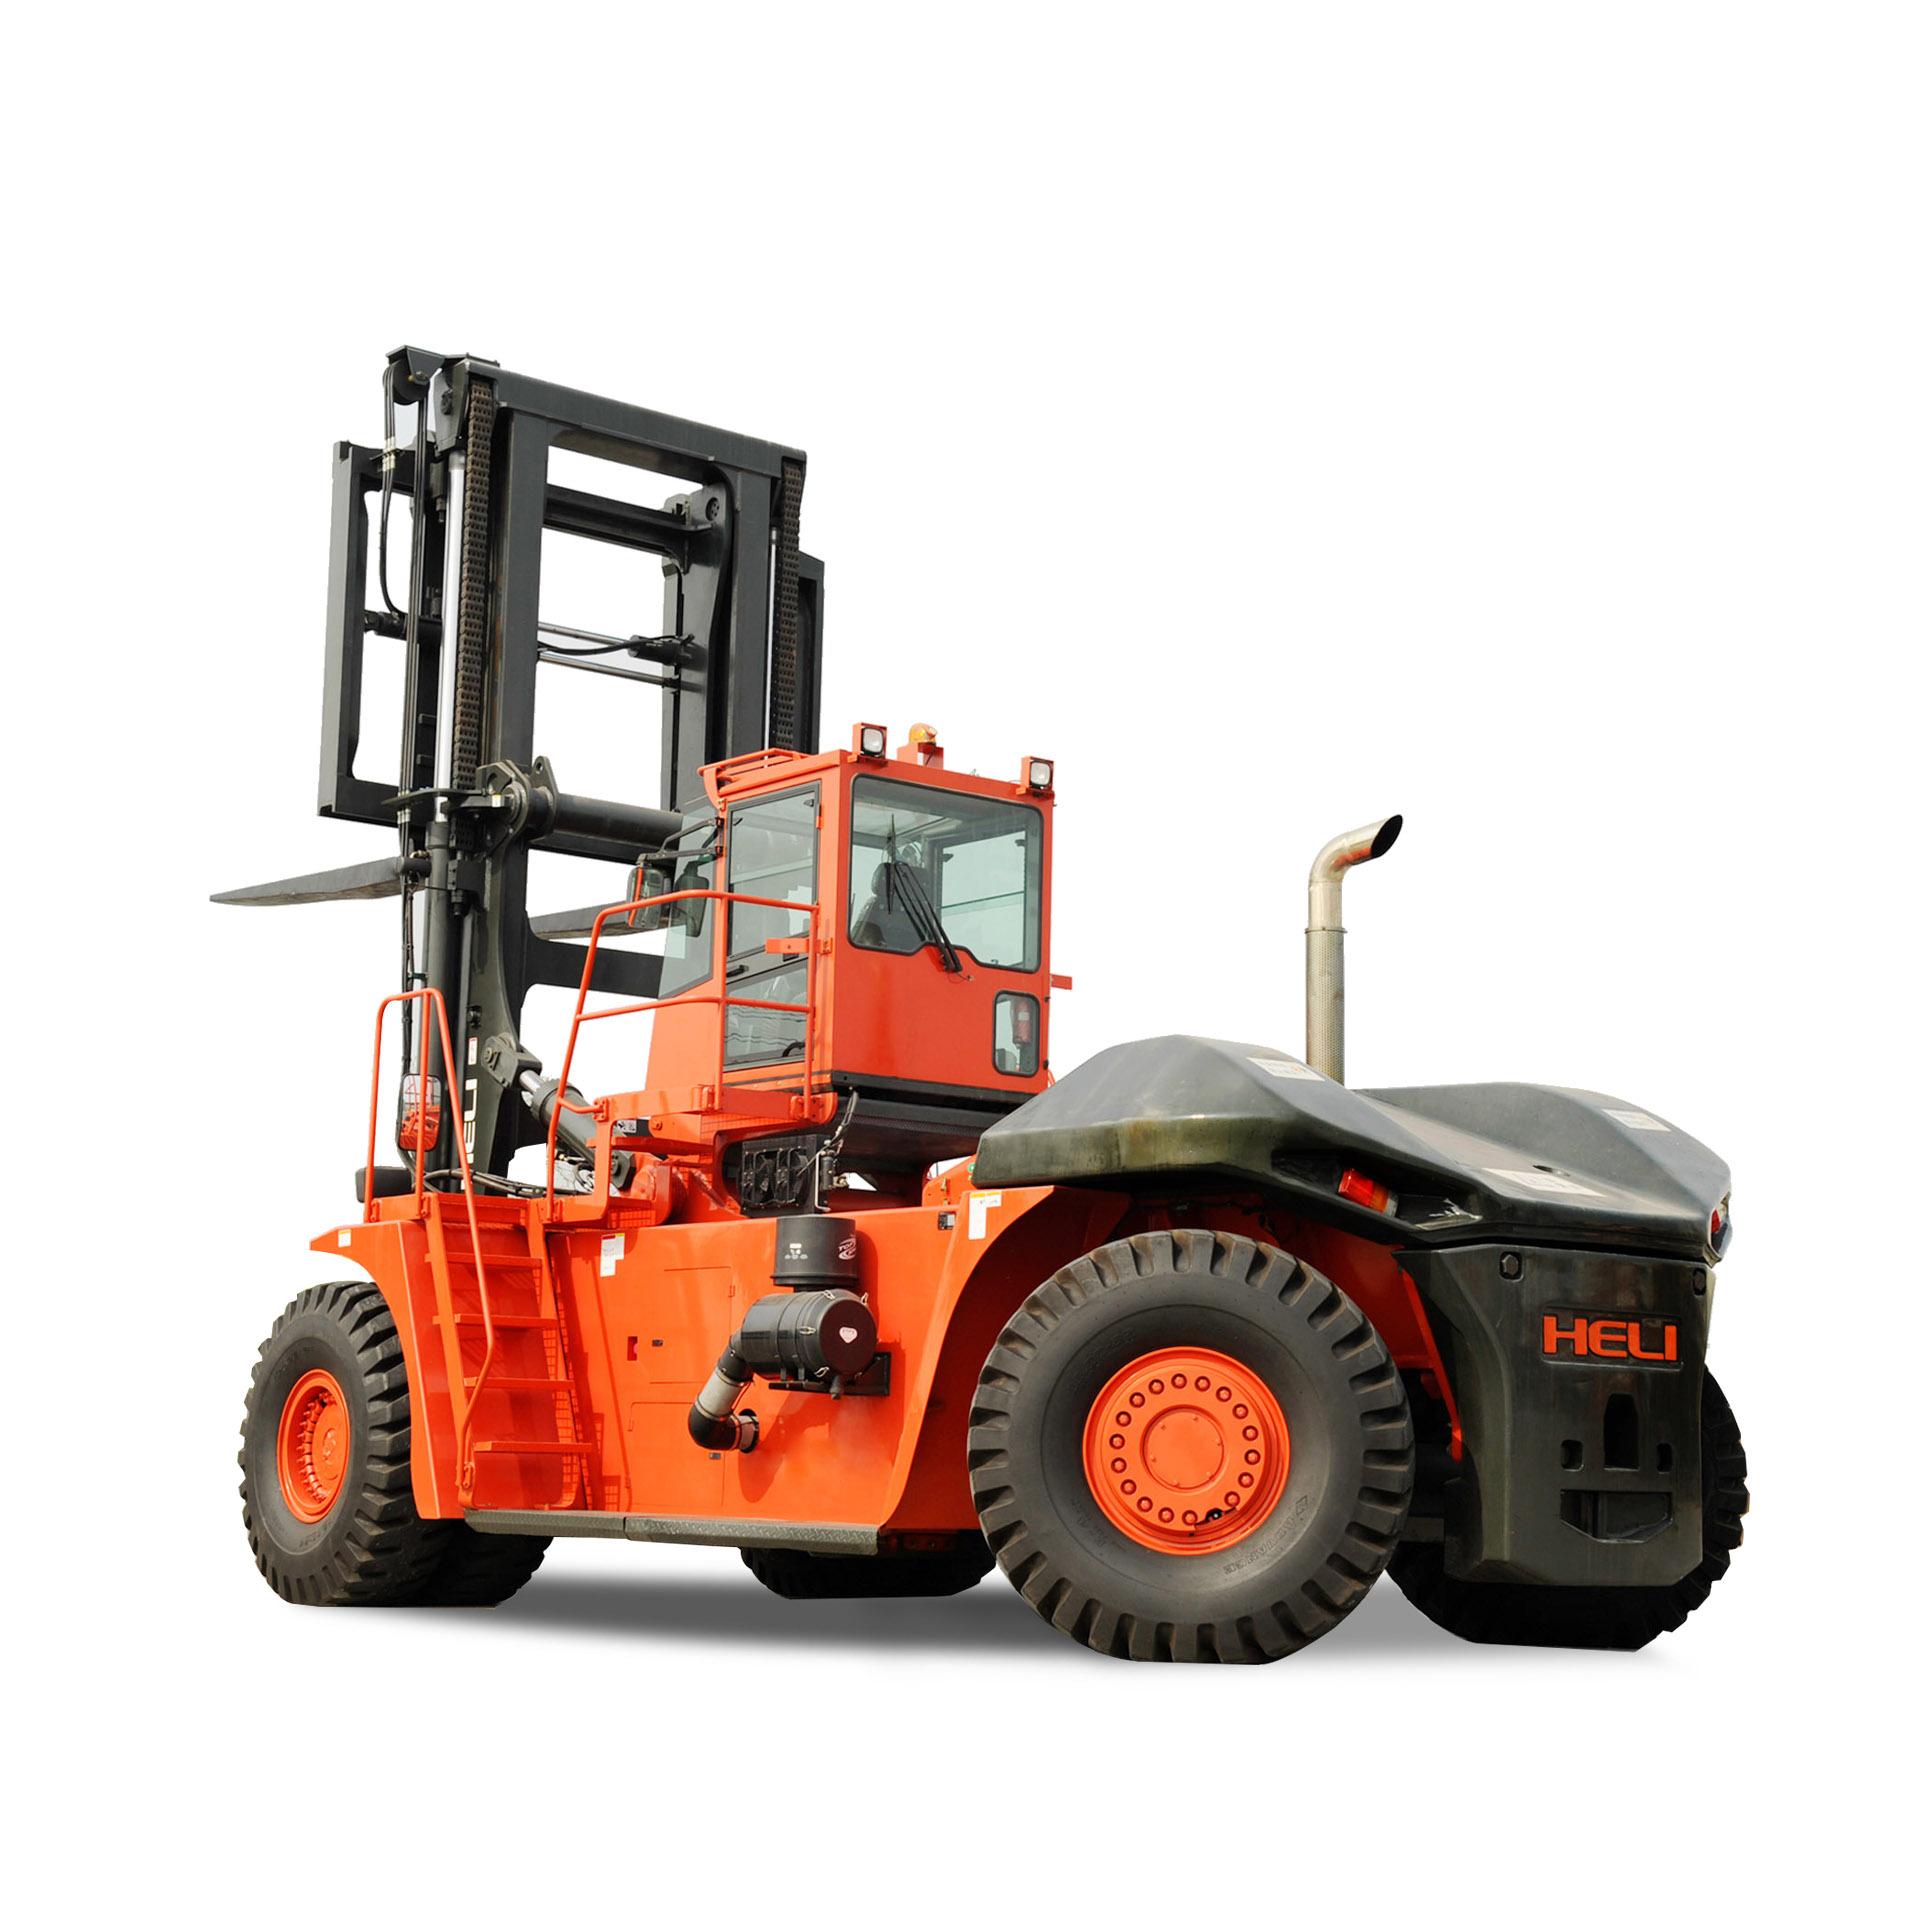 Gallery HELI 42-to-46 ton Diesel Forklift